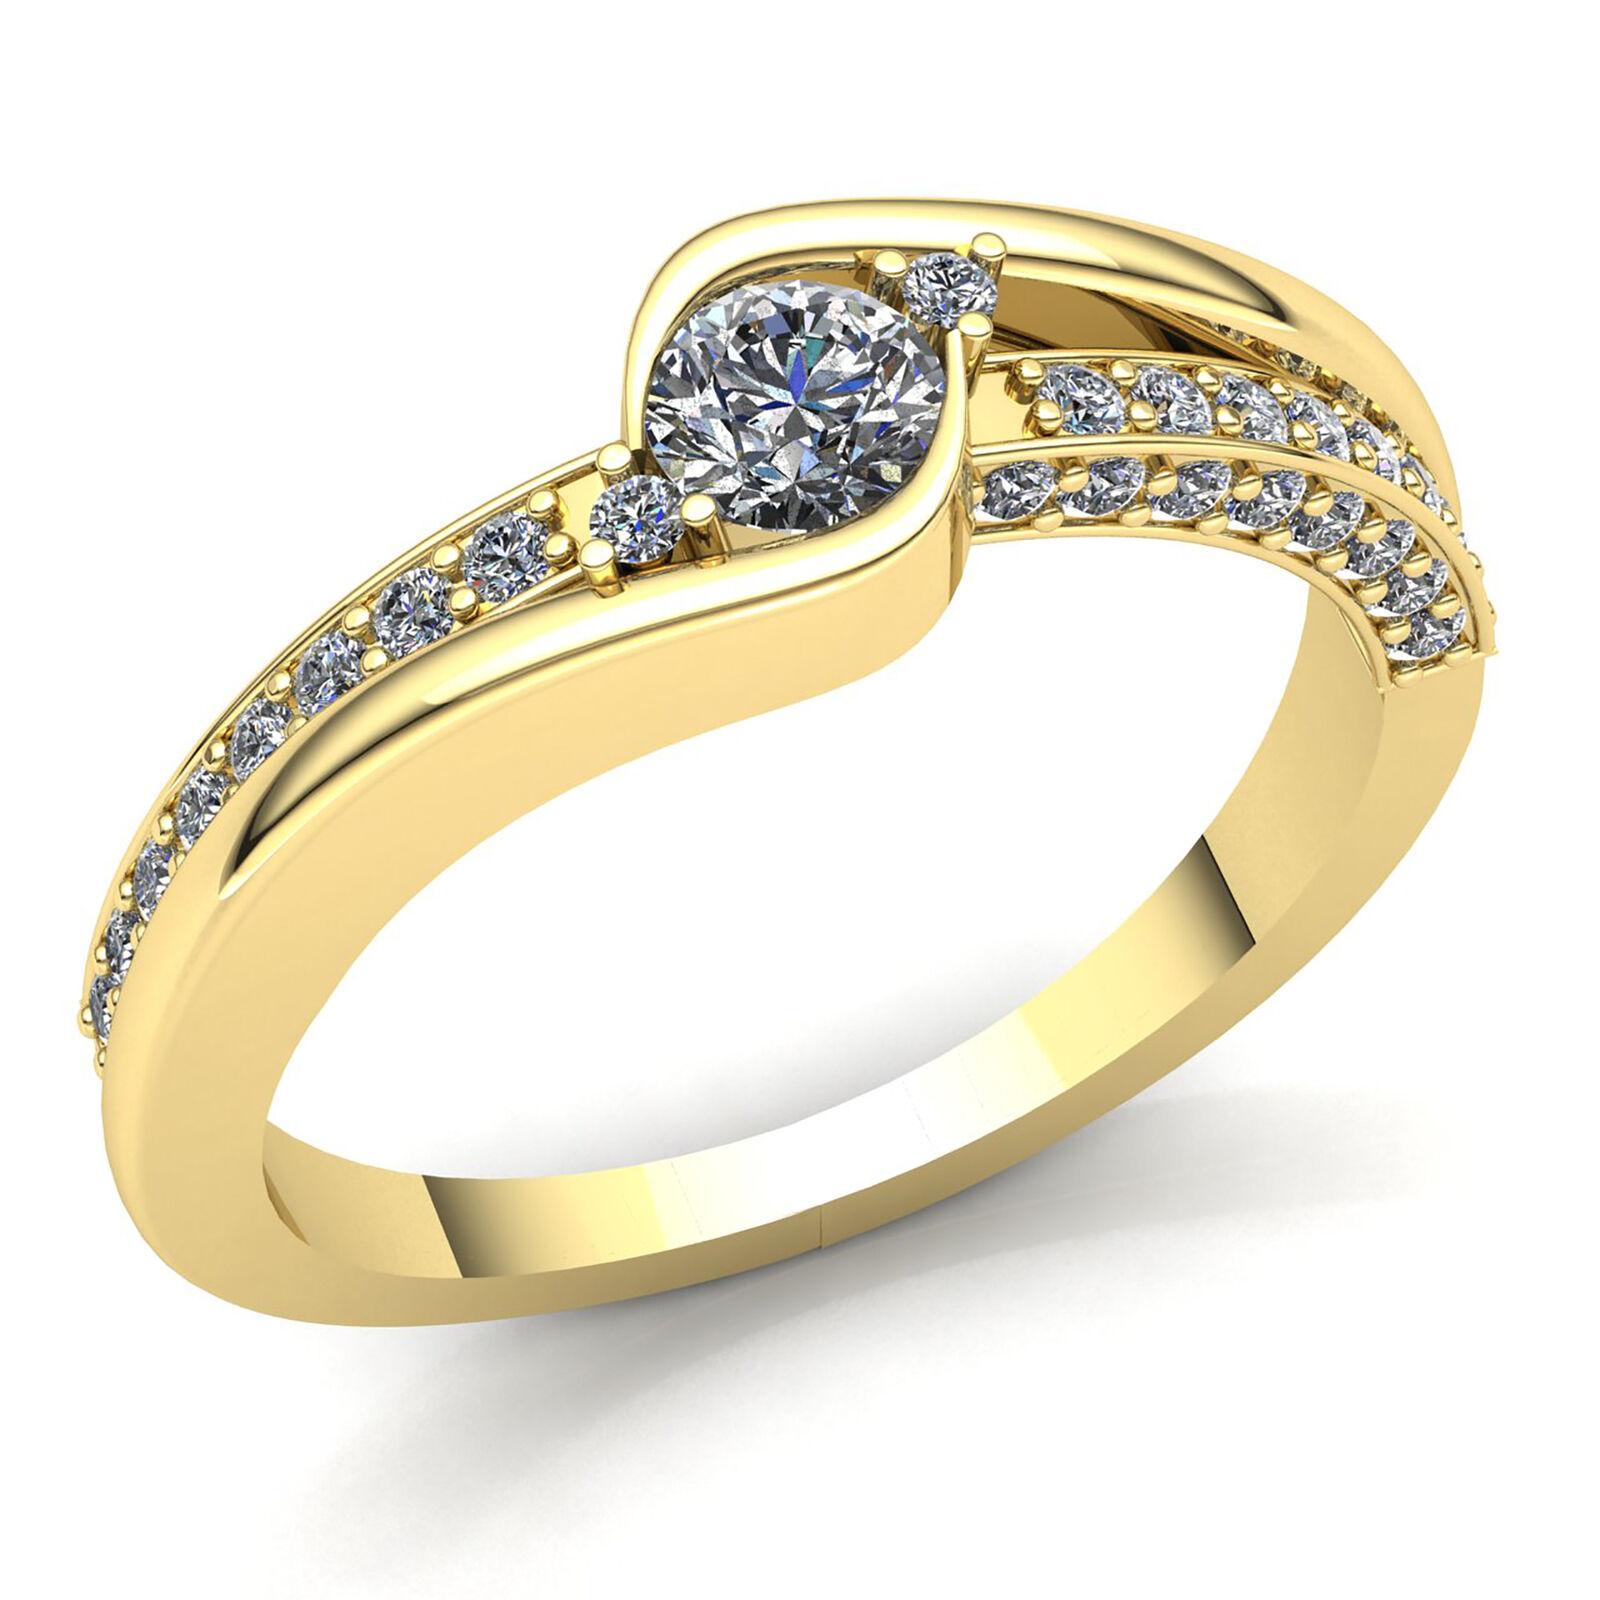 Natural 1ct Round Cut Diamond Ladies Bridal Solitaire Engagement Ring 10K gold